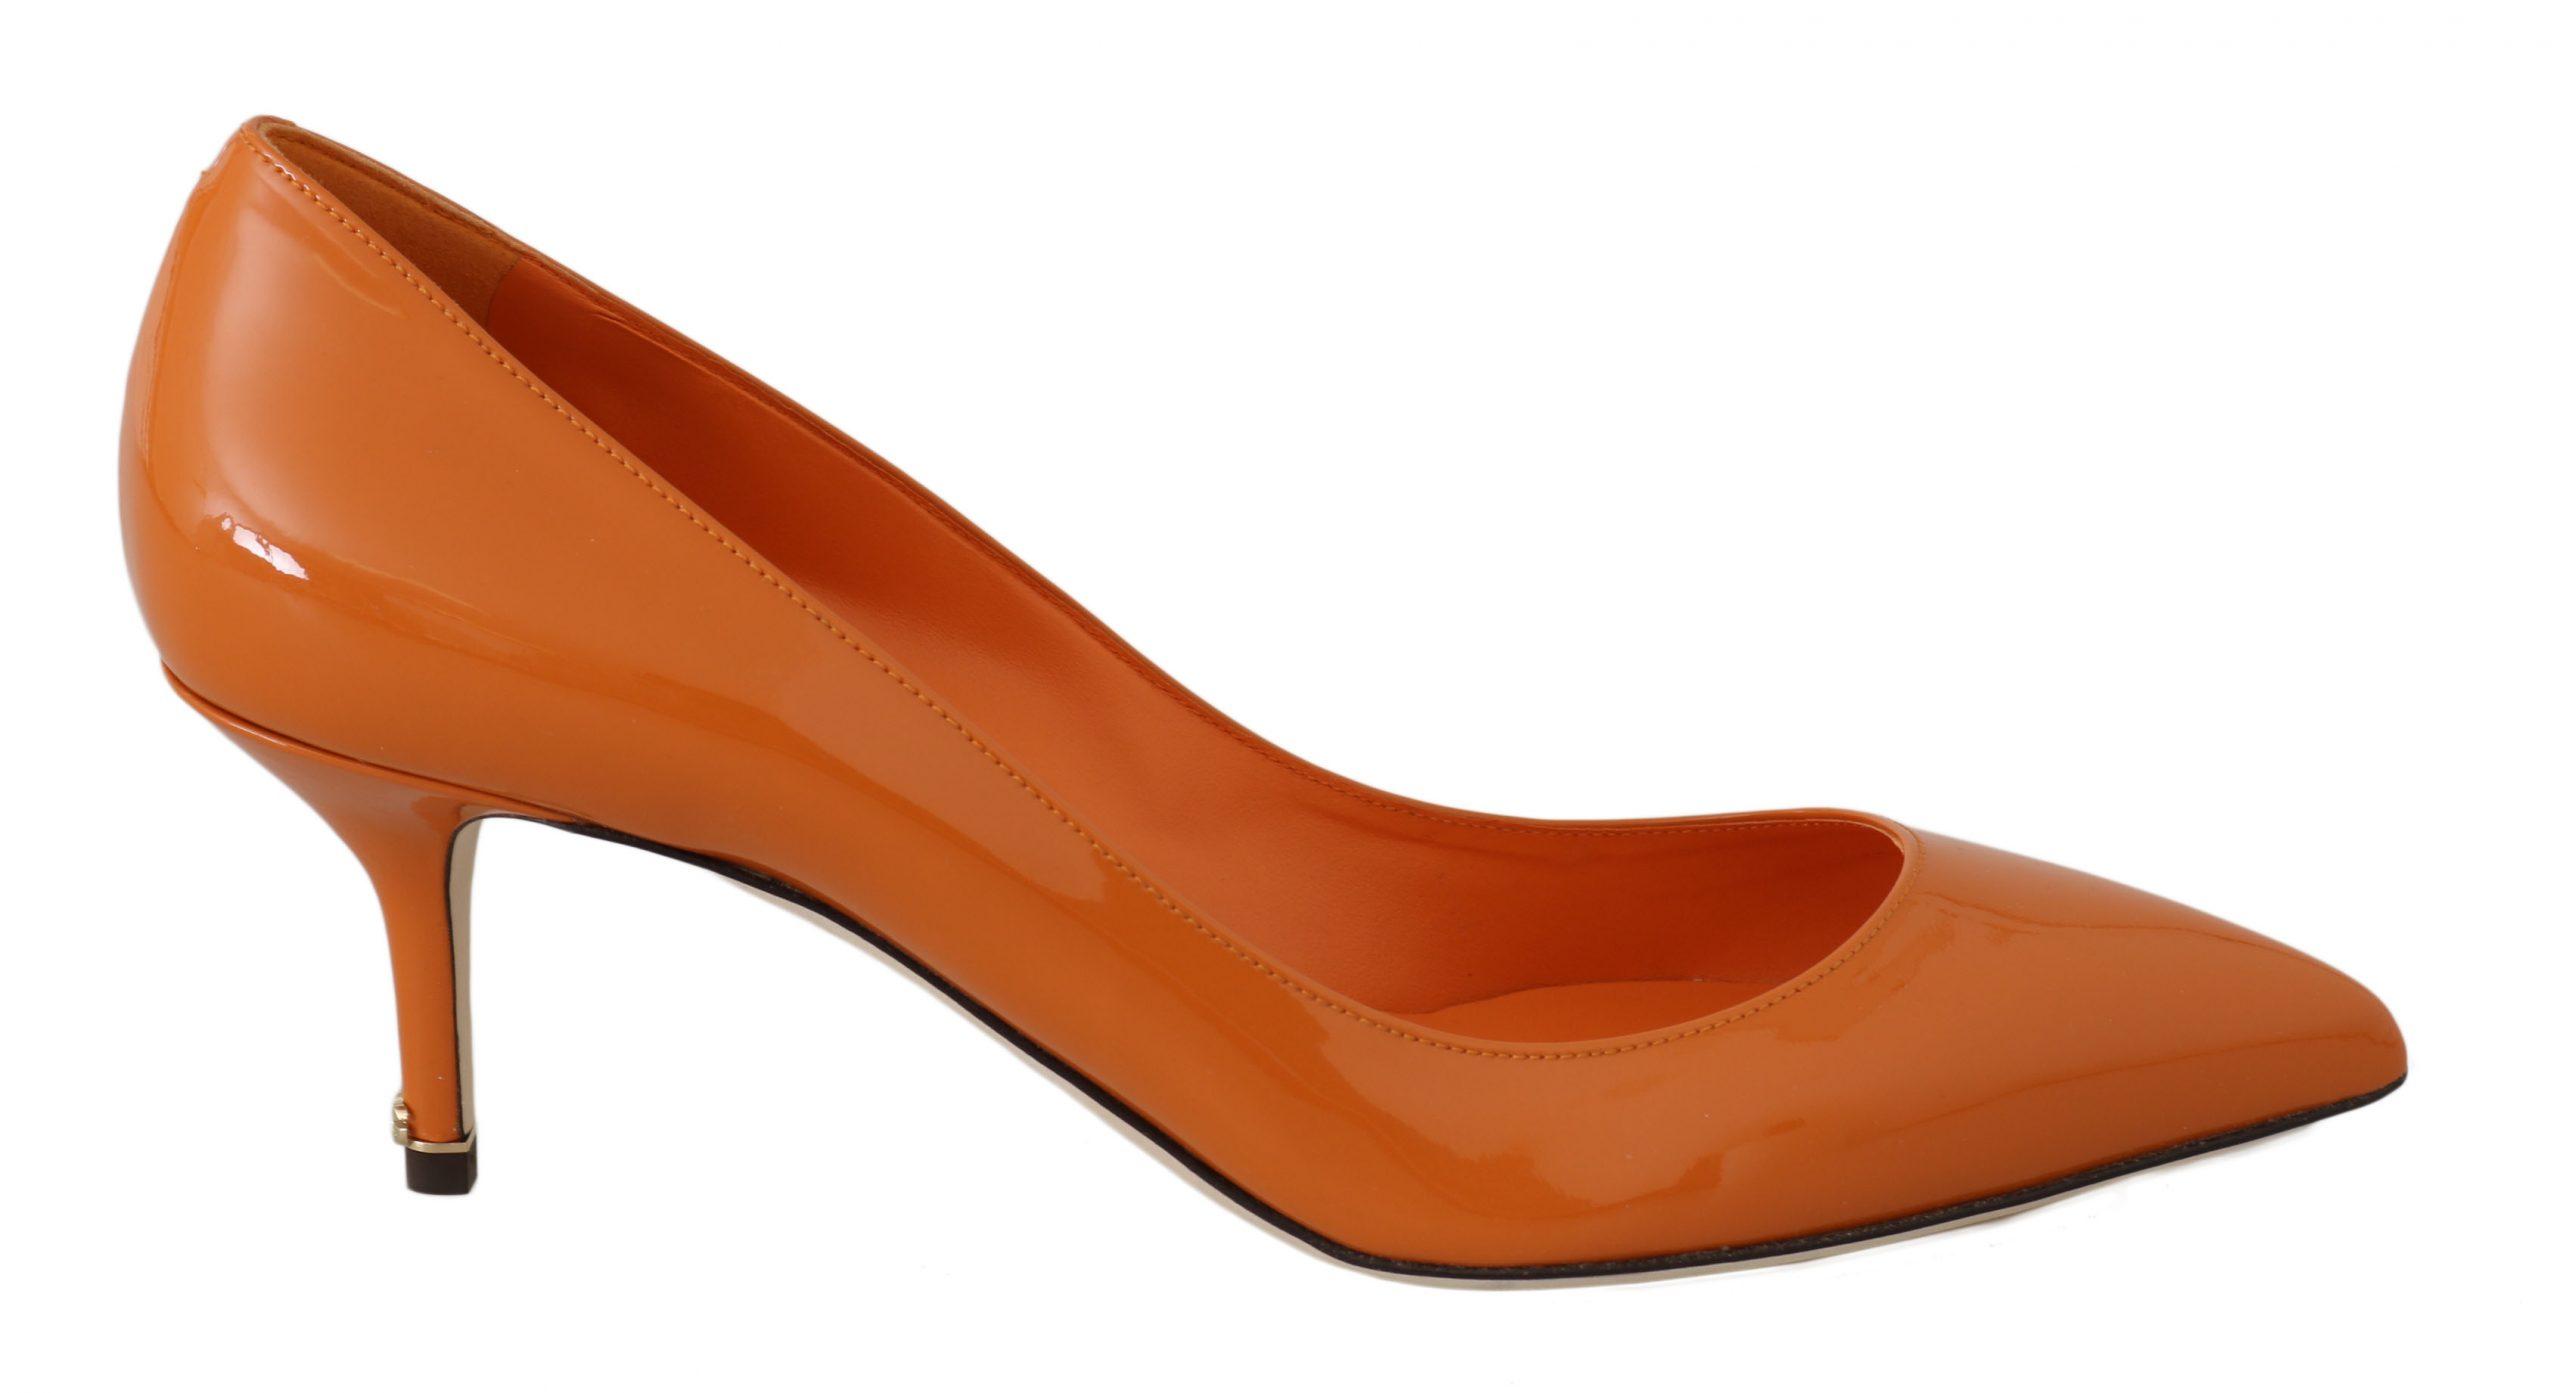 Dolce & Gabbana Women's Patent Leather Heels Orange LA5968 - EU40.5/US10